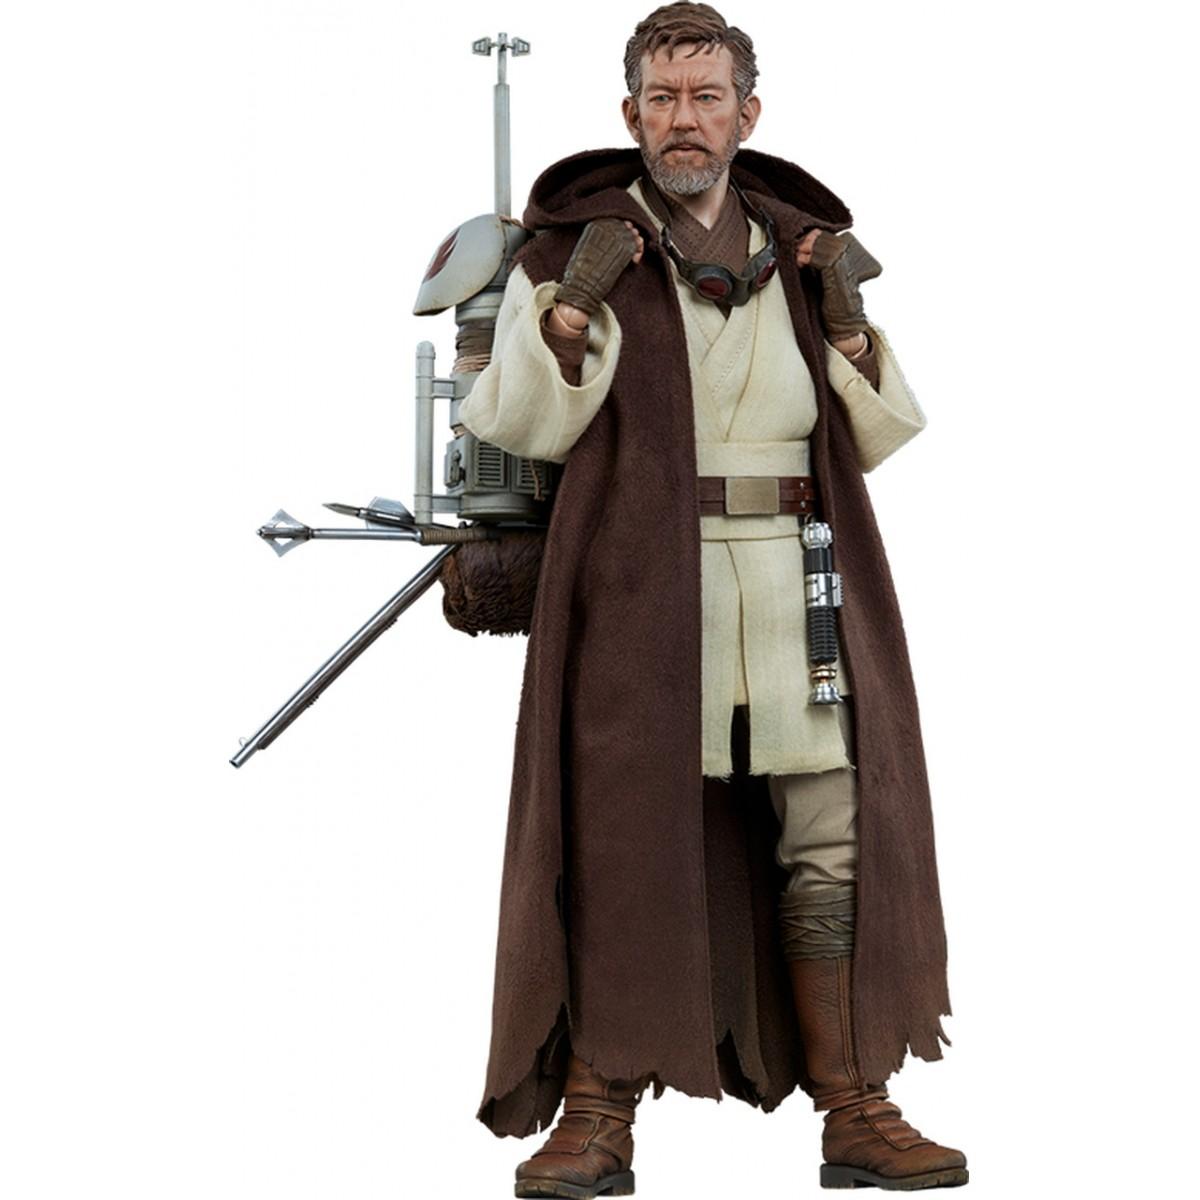 PRÉ VENDA: Boneco Obi-Wan Kenobi: Star Wars Mythos Escala 1/6 - Sideshow